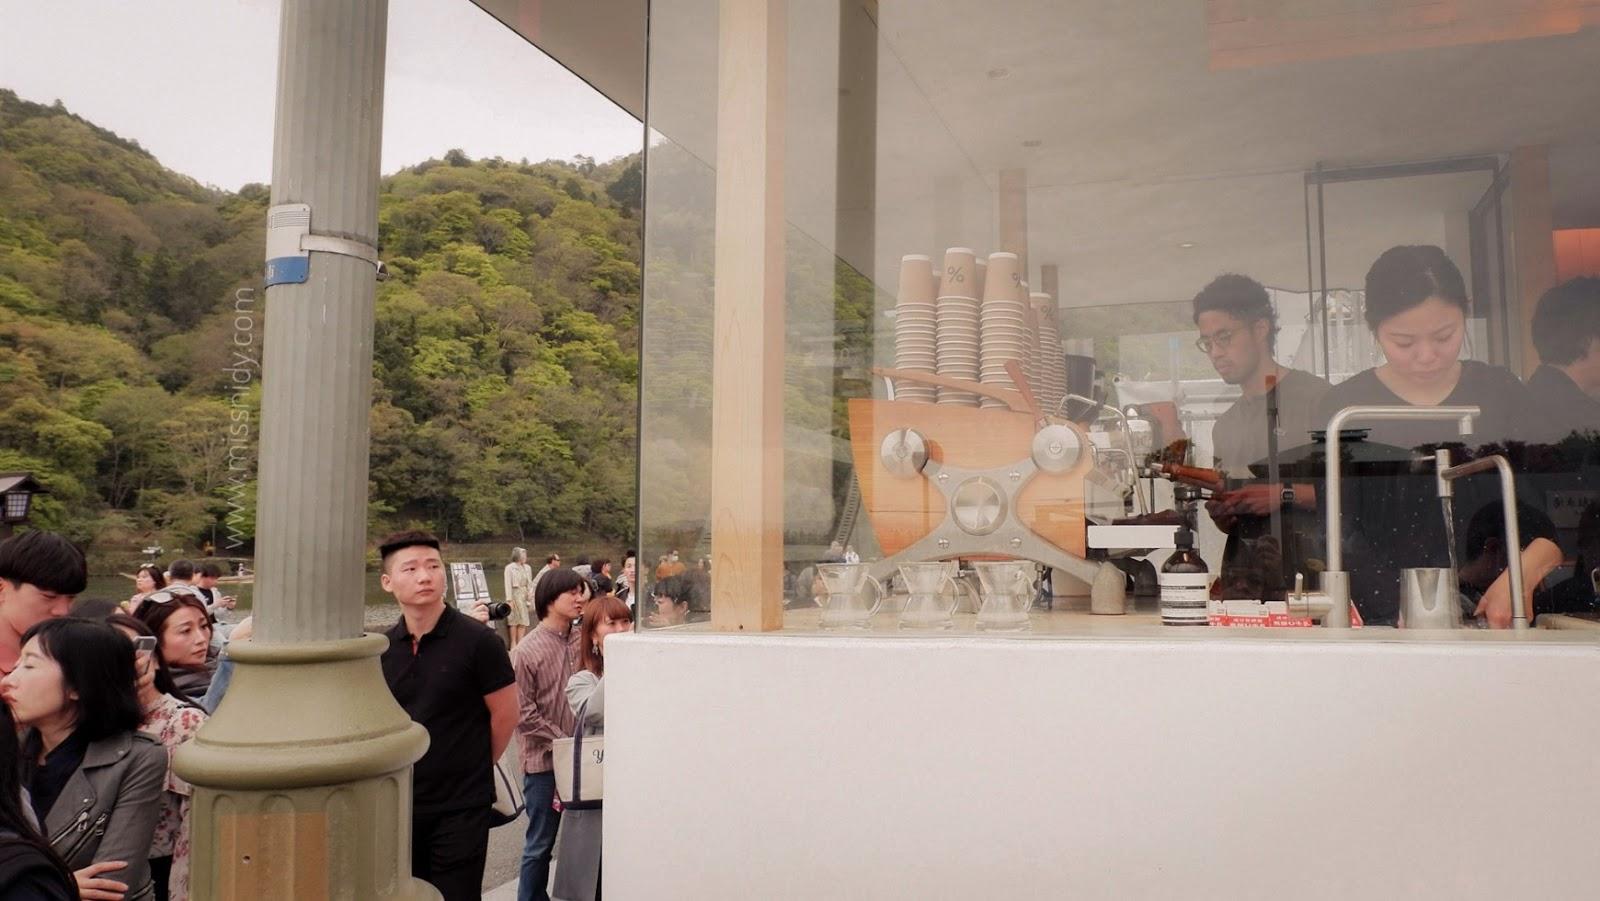 kopi paling enak di jepang